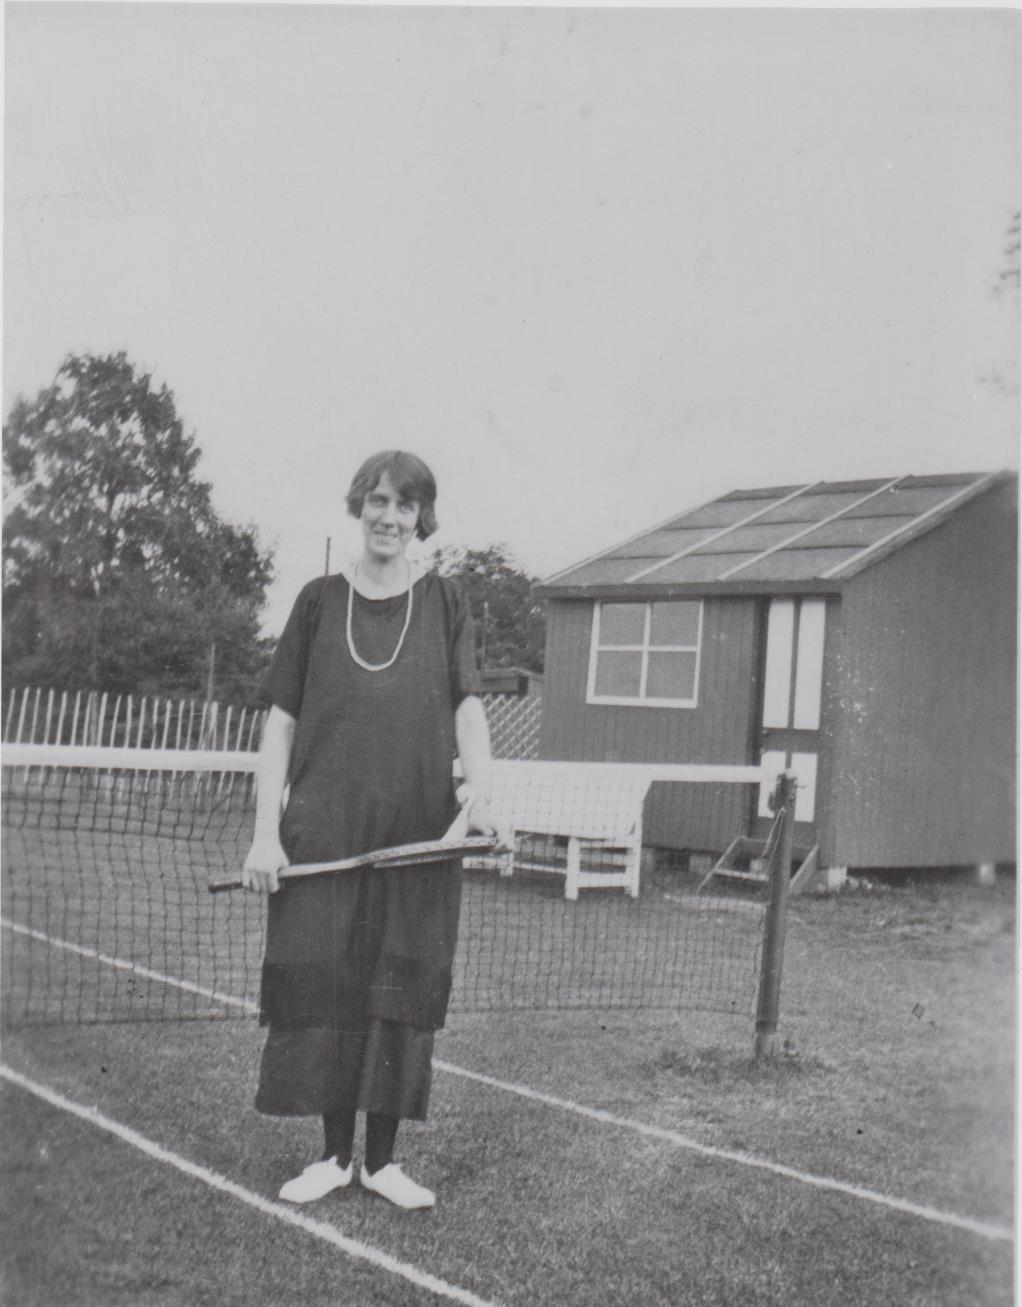 h625_tennis_lady-001.jpg